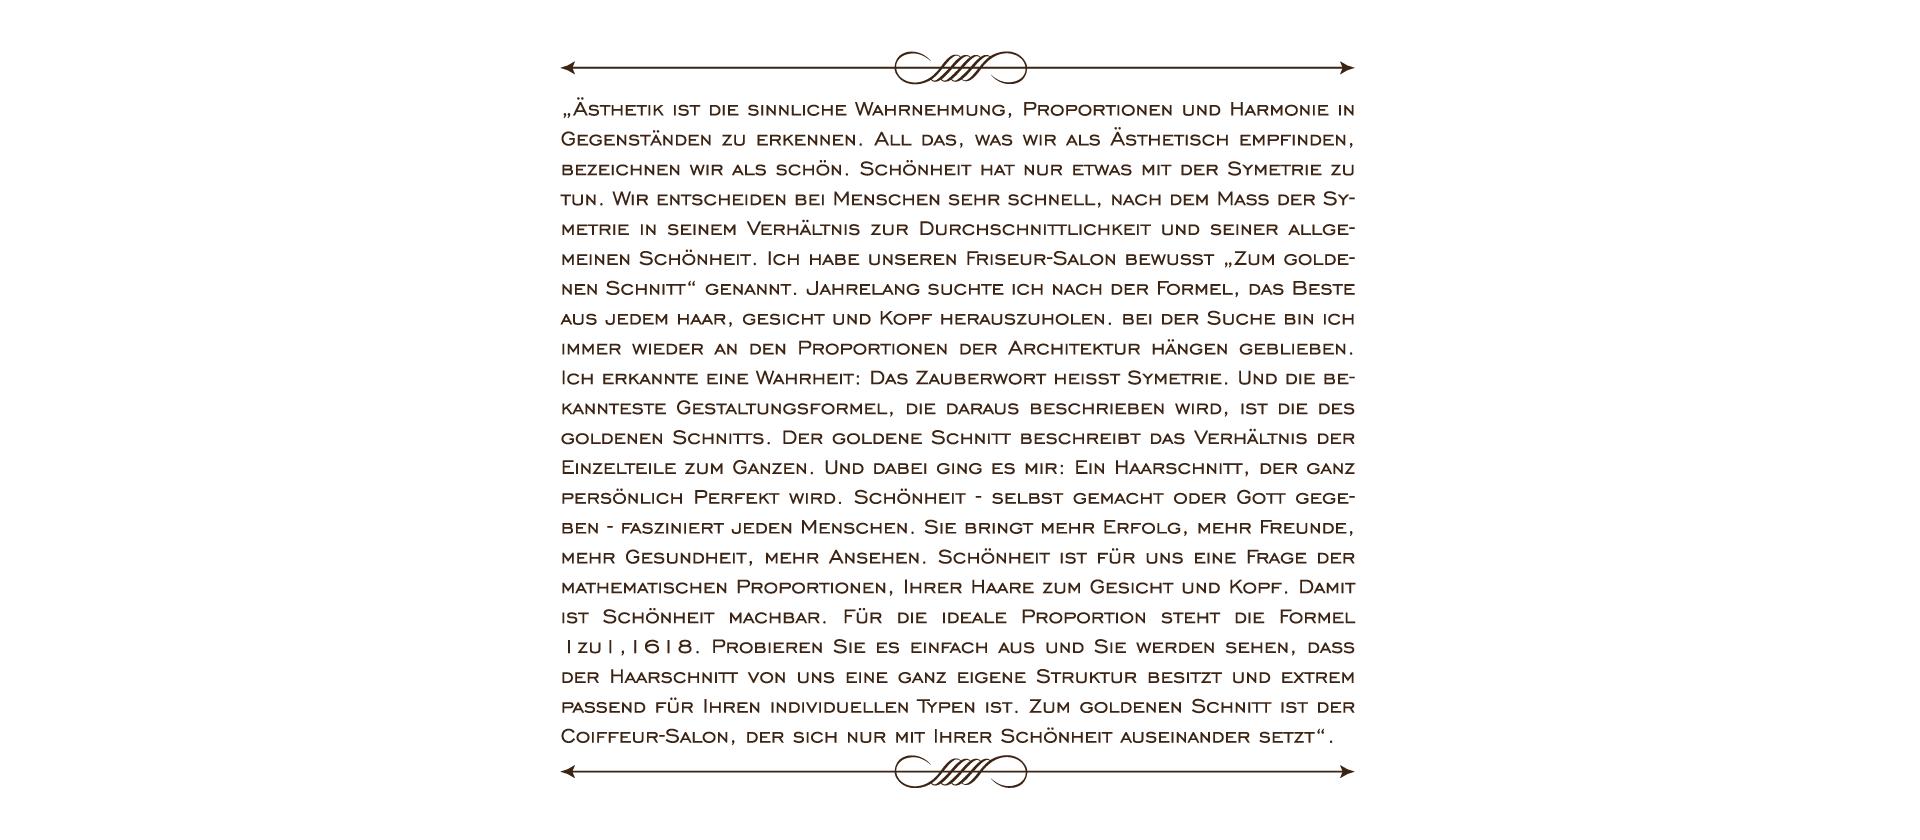 Markenbildung Marken Media Medien Responsiv Websites Marketing WordPress Bamberg Web-Designs Web-Funktionen Web-Applikationen Web-Shop Logos Postern Geschäftsausstattungen Packaging Messe & Event Designs Film-Designs Namings Slogans Werbetexten Bild-Text-Sprache Geschäfts-& Pressetexte Story-Boards Masterkonzepten Key-Photos Photoshootings Portraitfotos Video-Productions Film-Productions Werbung Bamberg Nürnberg Kulmbach Coburg Bayreuth Erlangen Hof